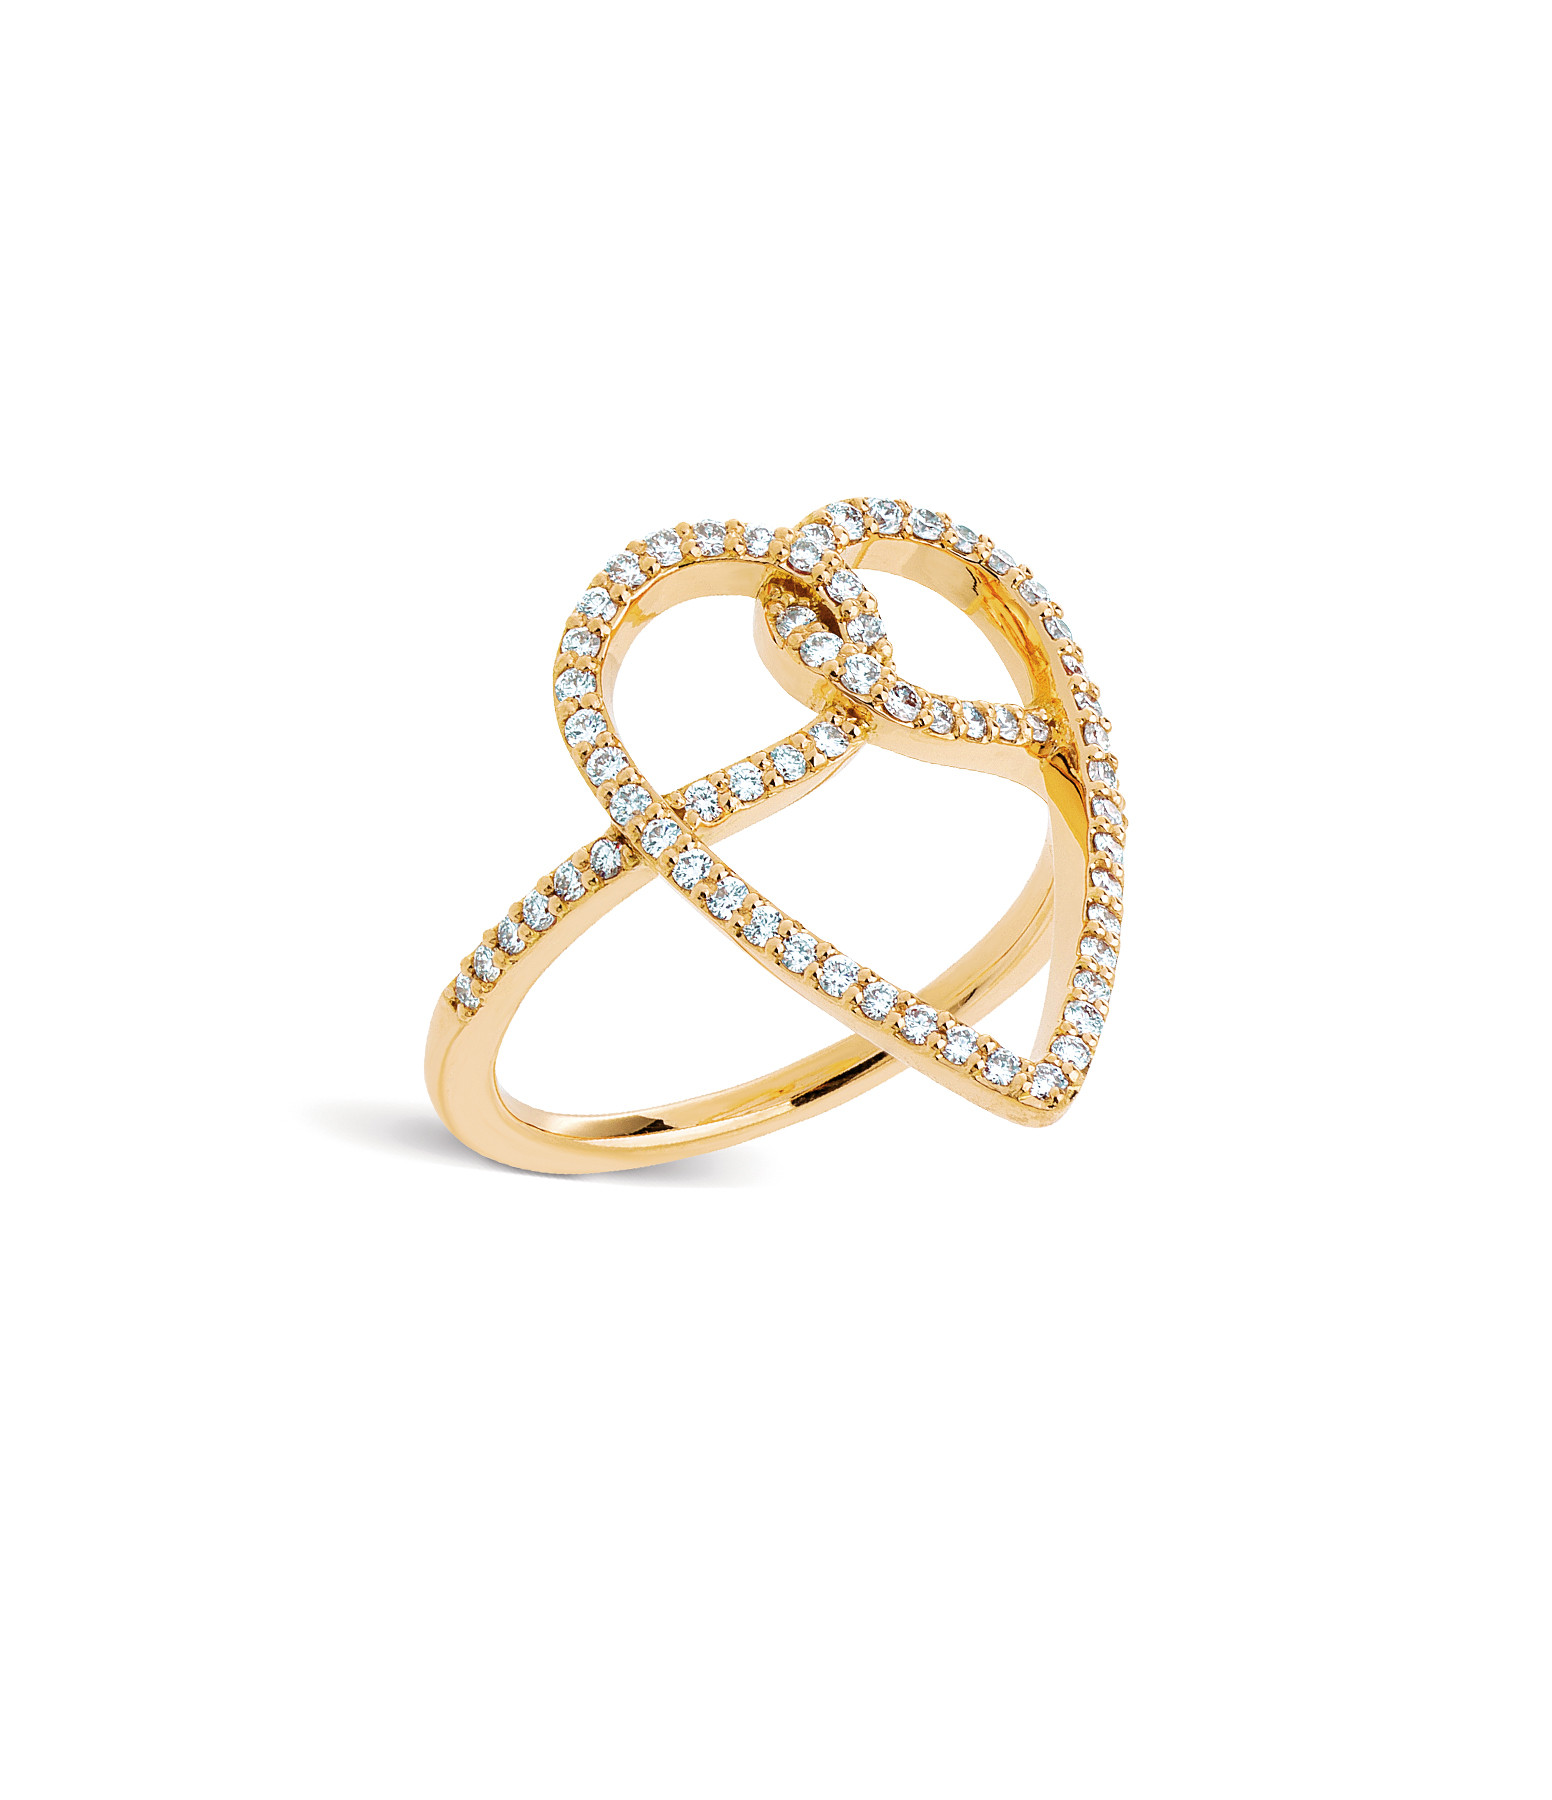 NAVA JOAILLERIE - Bague Joli CÂœur Diamants Or Jaune